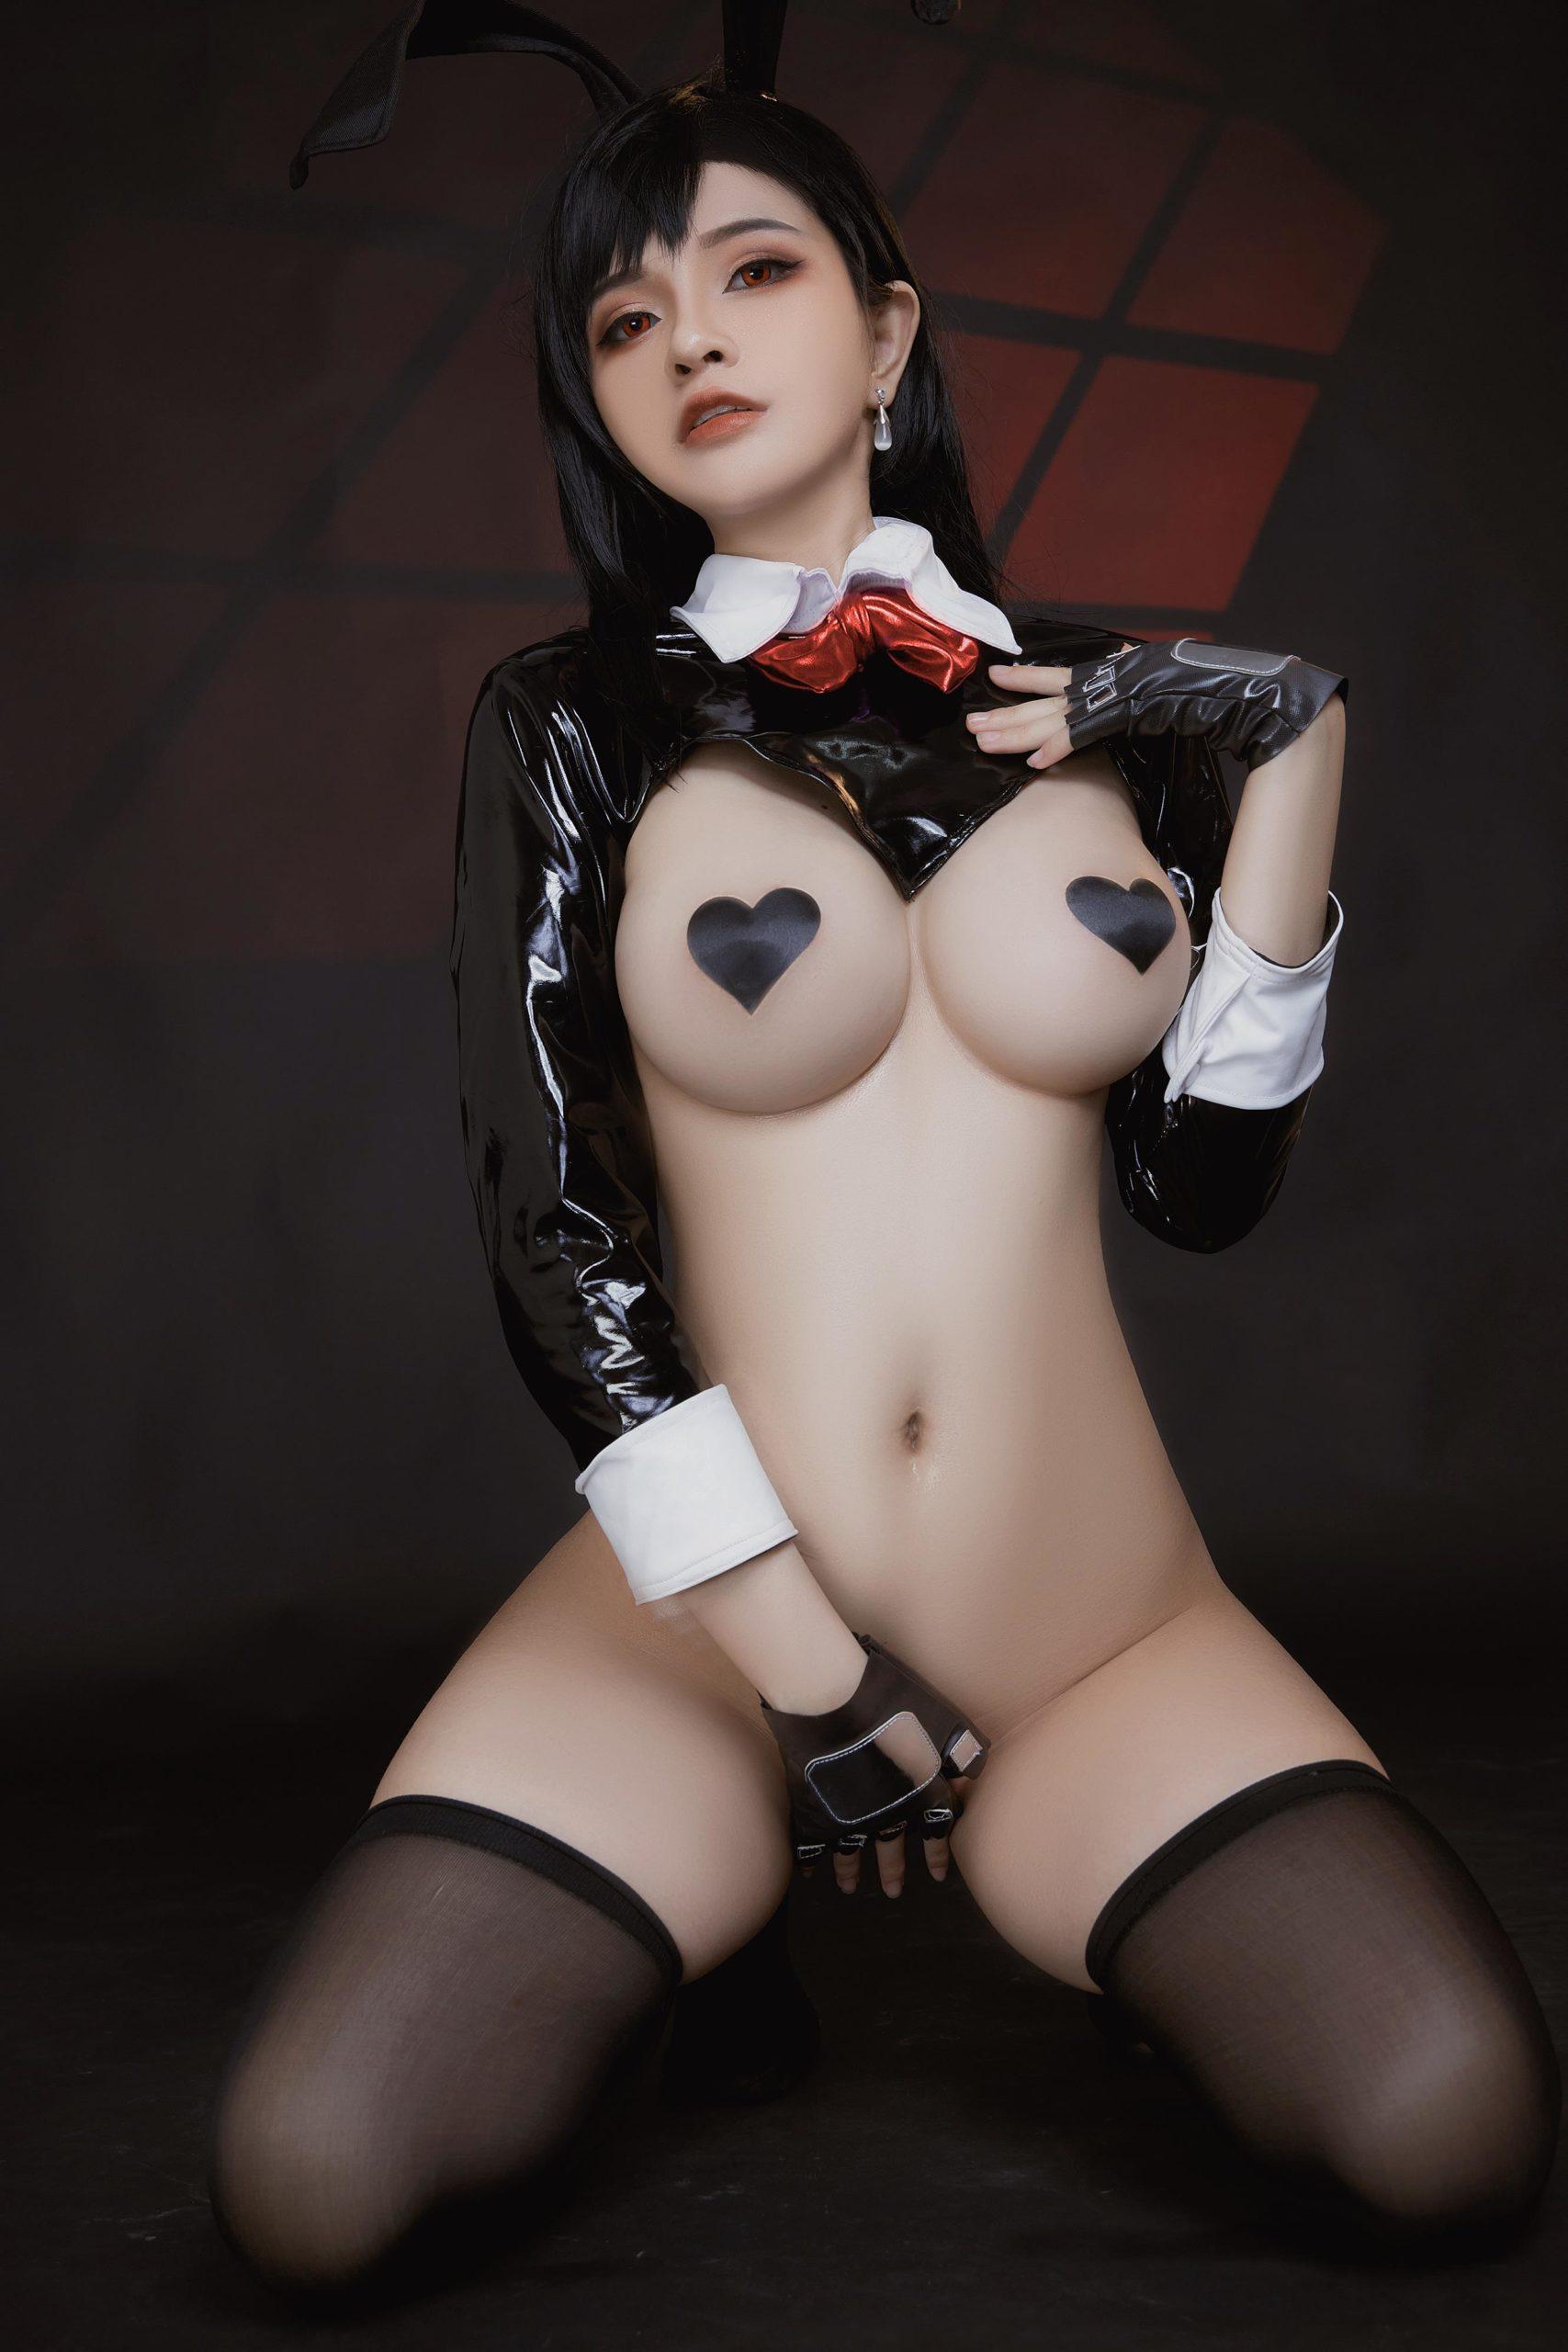 Tifa Lockhart Bunny Girl Ero-Cosplay by Azami Barely Covered